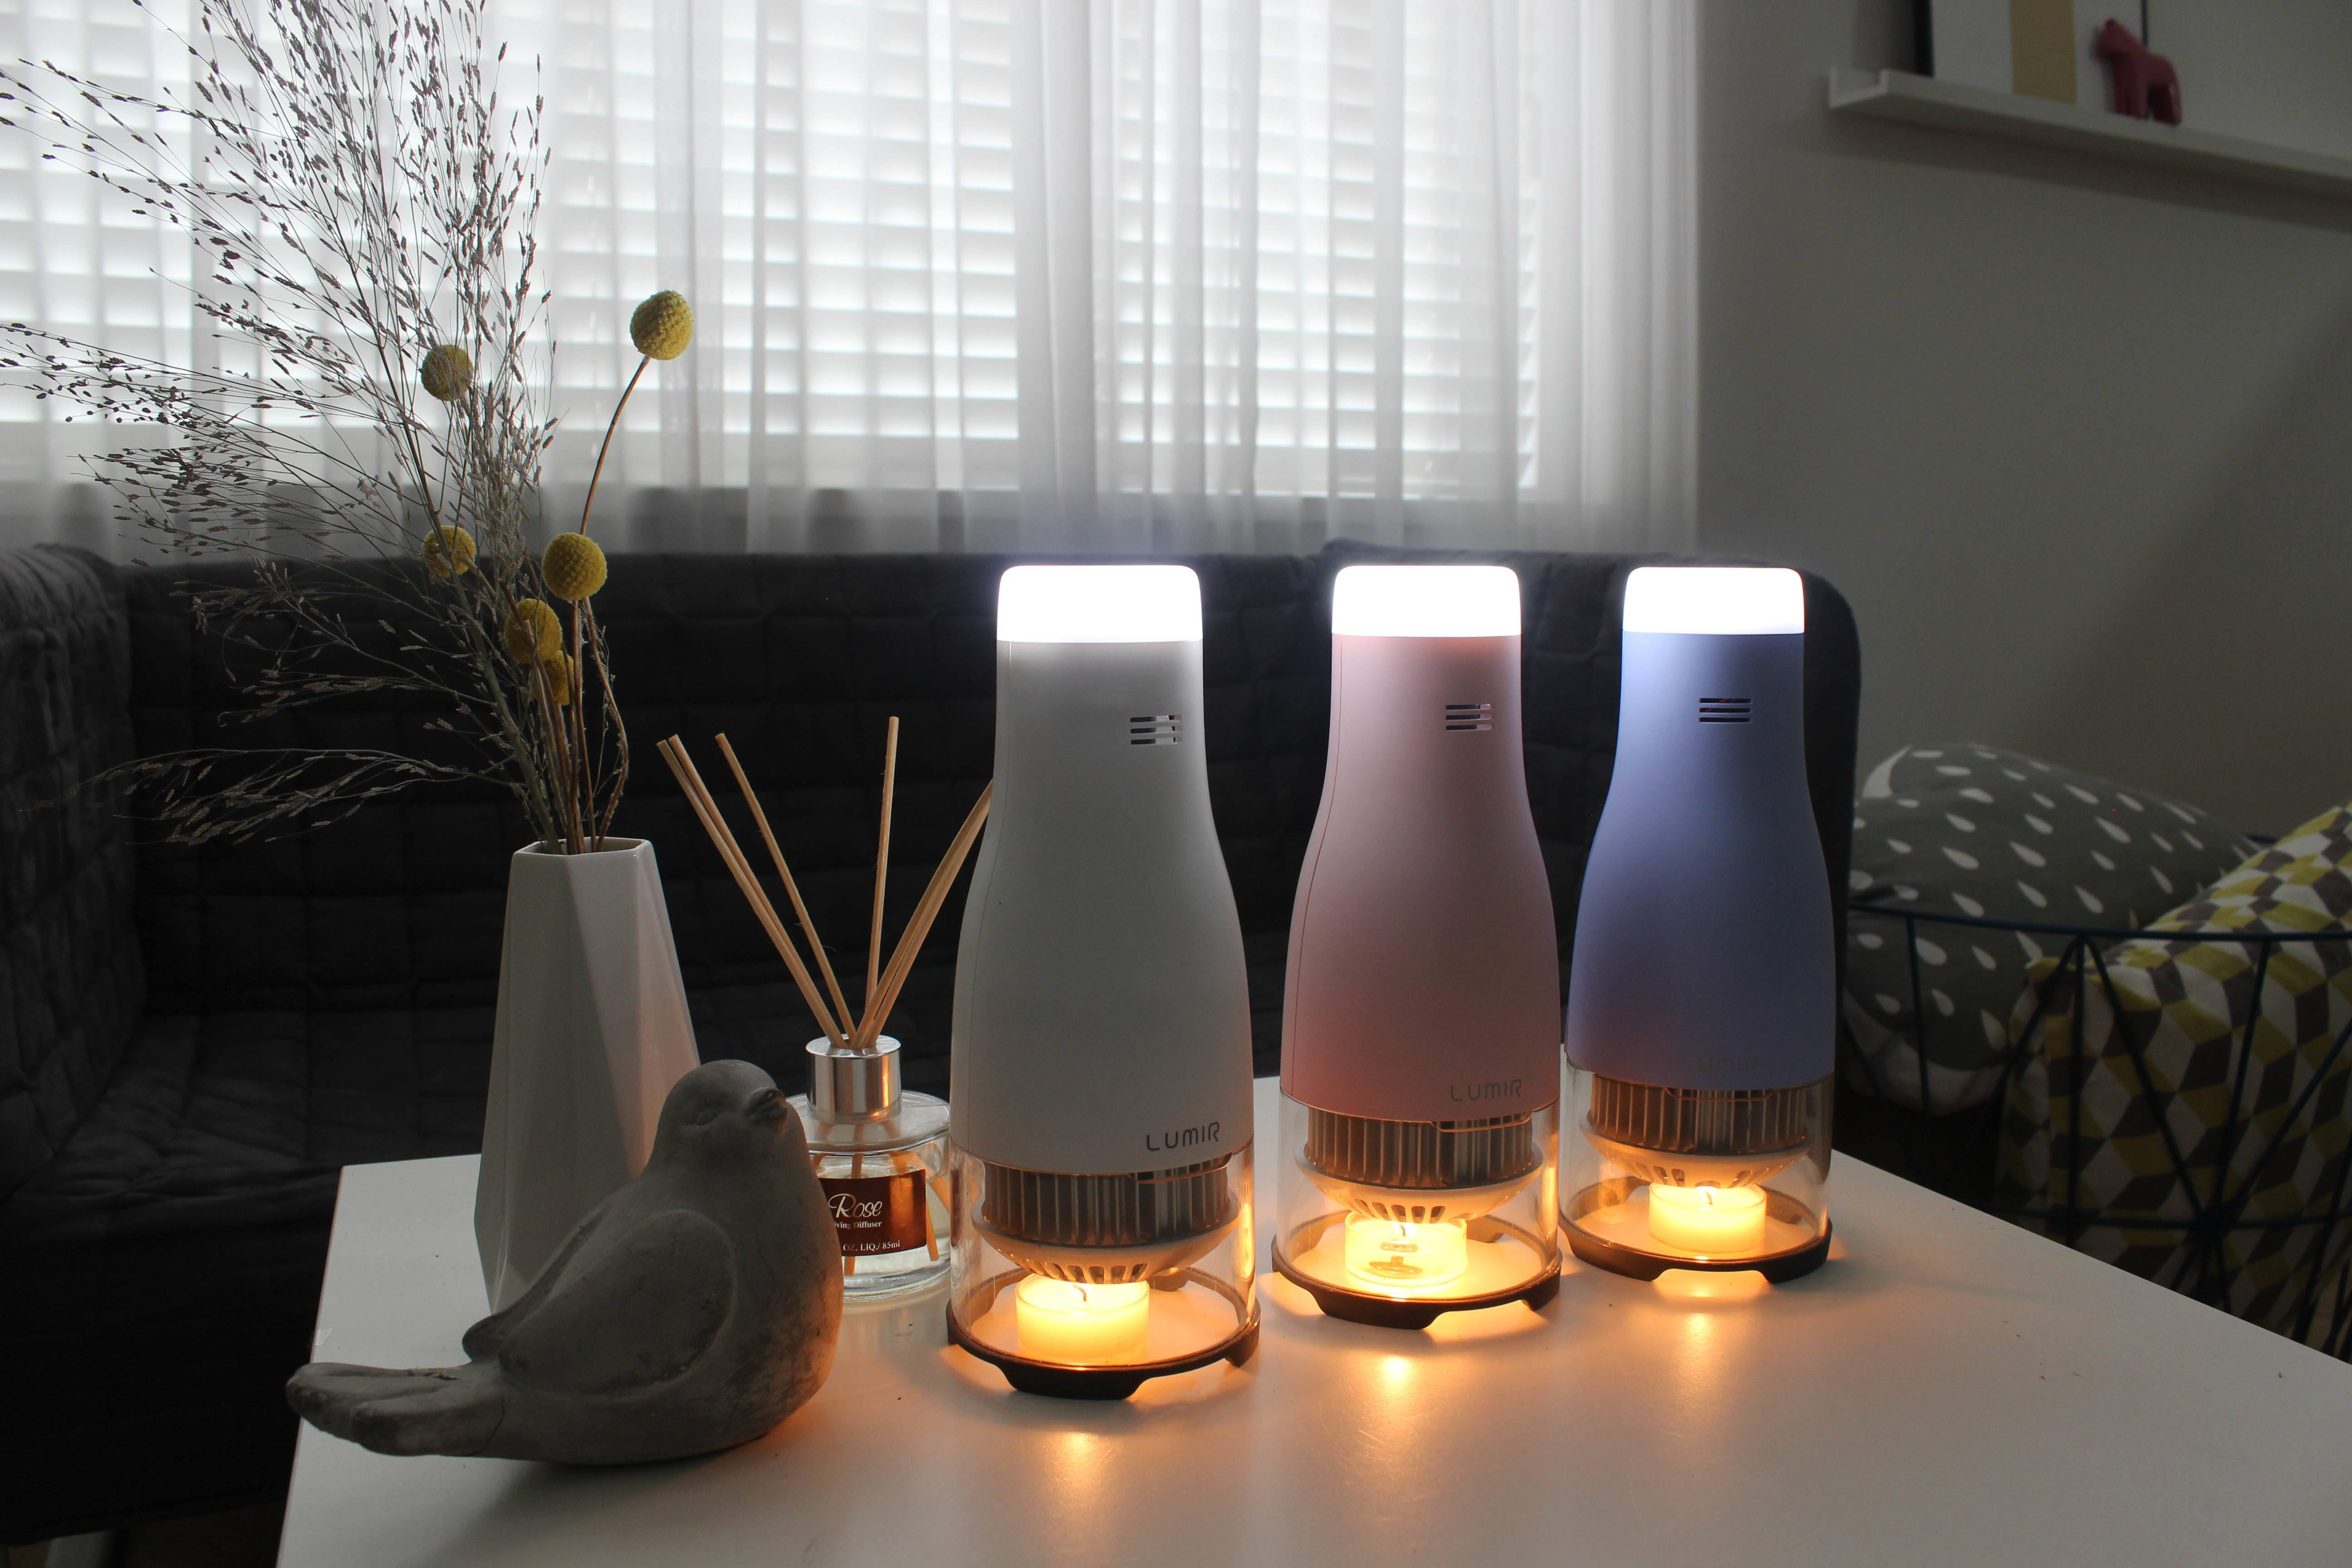 Led night light kickstarter - The Lumir C Mood Available On Kickstarter Emits An Ambient Led Glow 15 Times